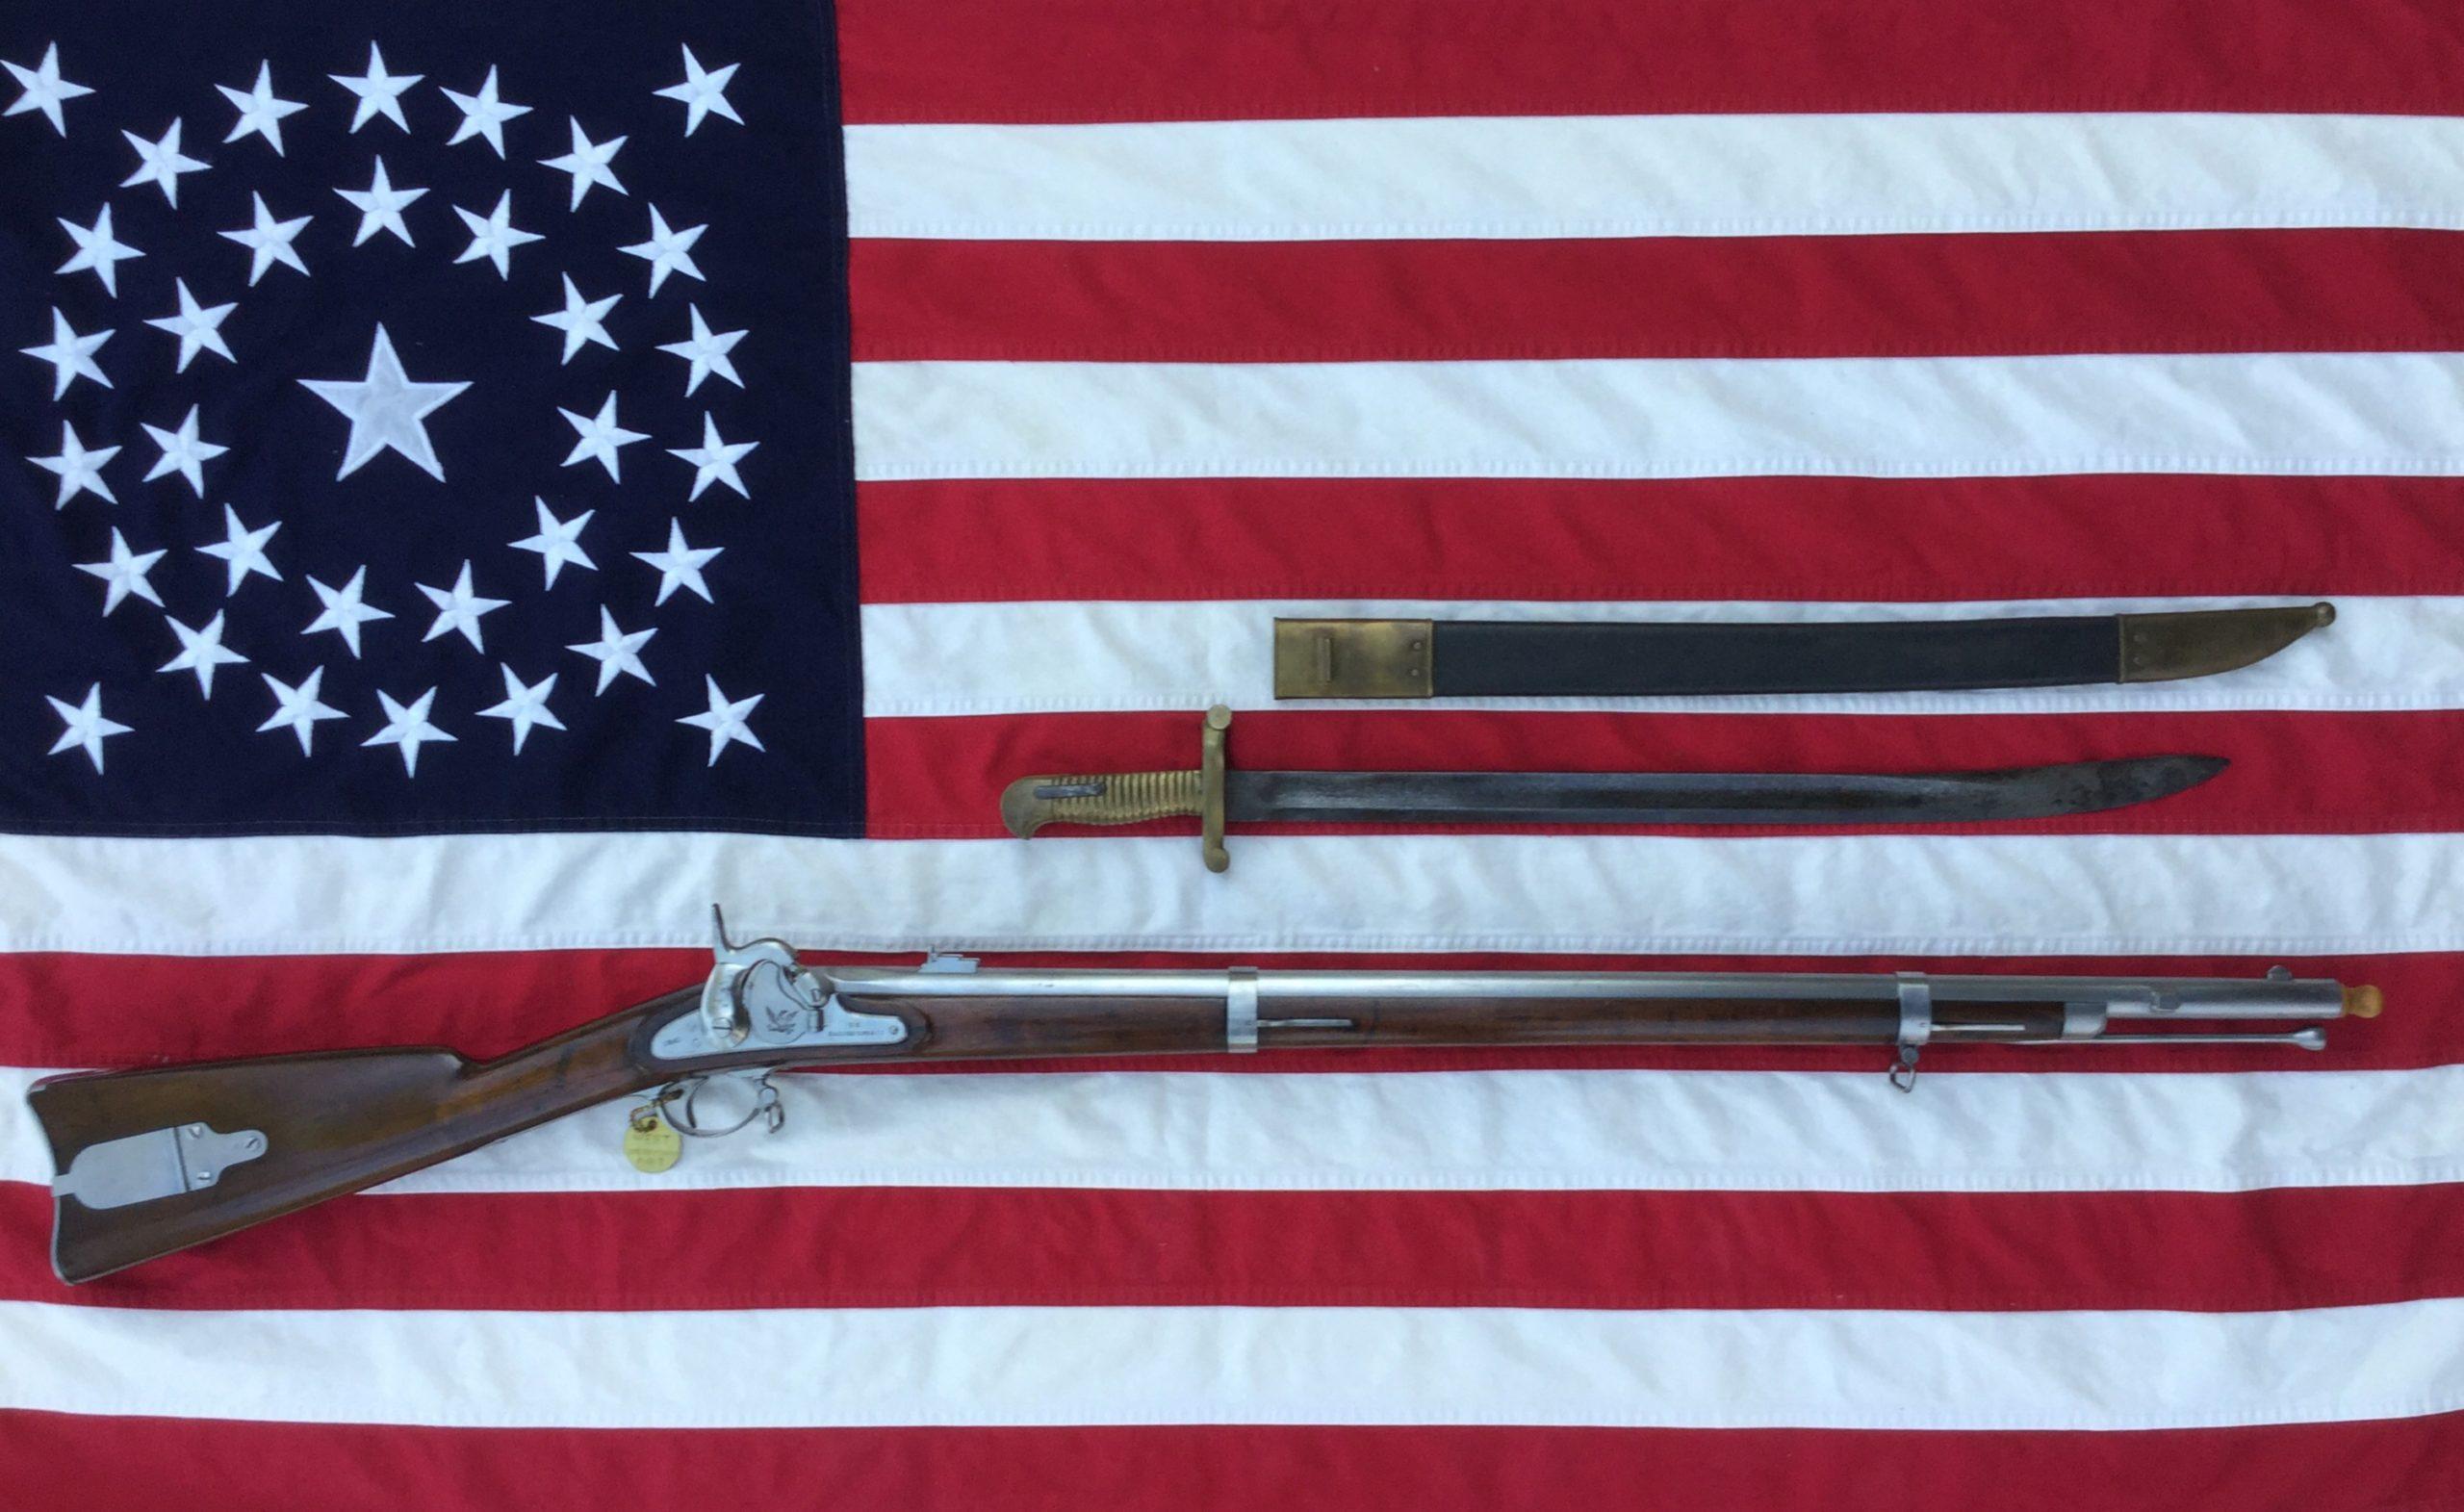 Model 1855 U.S. Percussion Rifle, 1860 Harper's Ferry Rifle